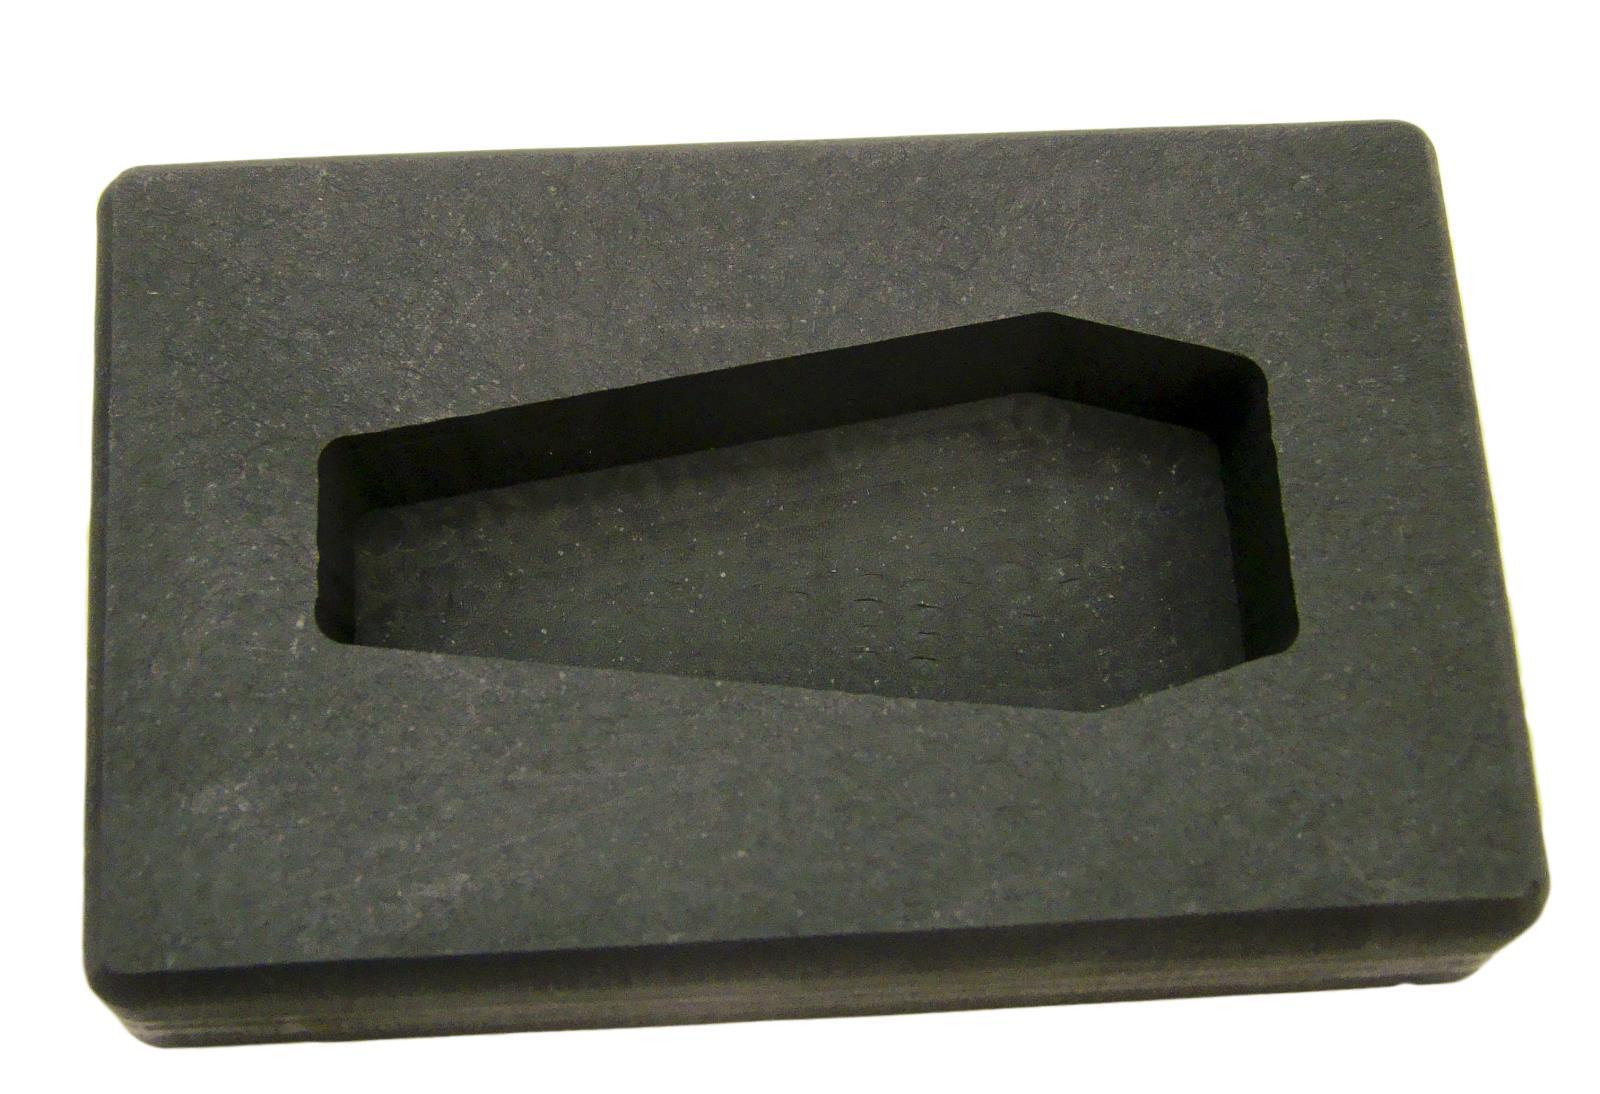 "FOAMMA 1-10/"" x 24/"" x 29/"" High Density Upholstery Foam New Cushion Replacement"